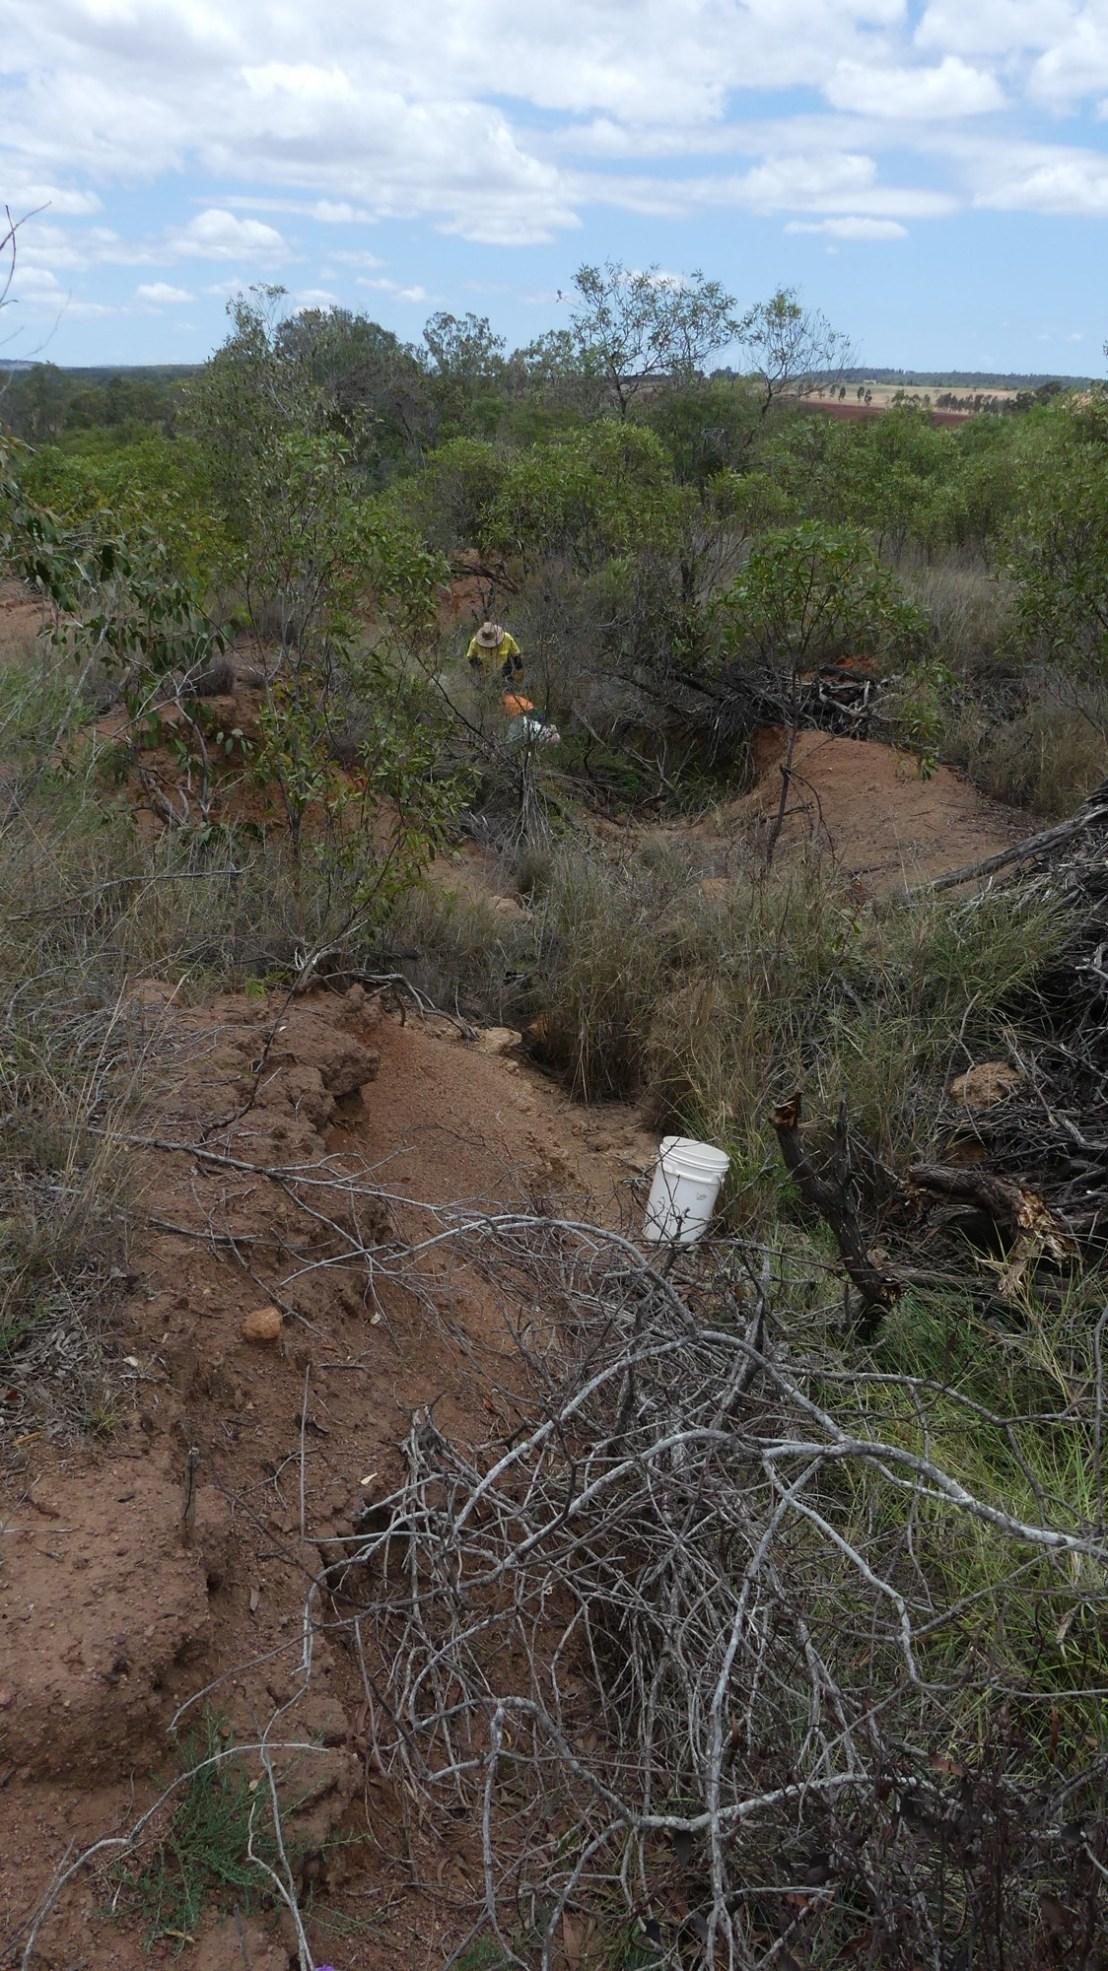 Lantana removed from eroded gully, November 2020.